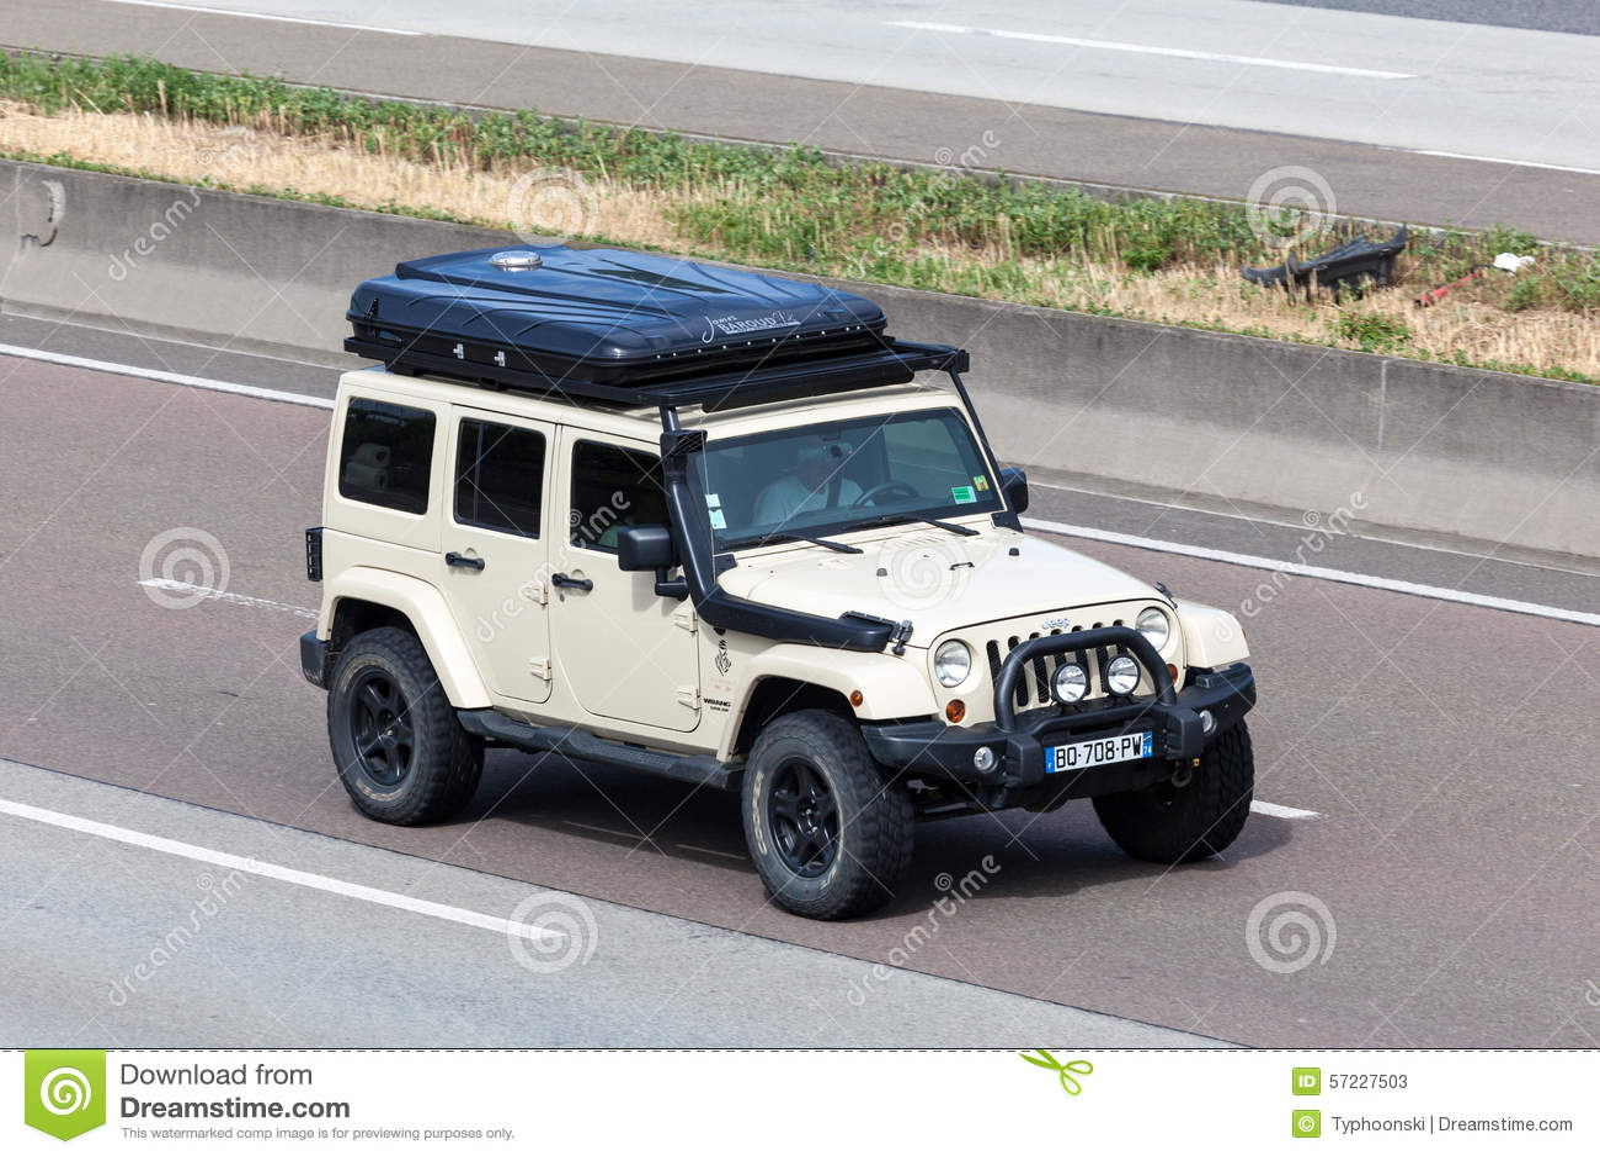 Jeep Wrangler Unlimited Sahara Mit Einem Dachzelt